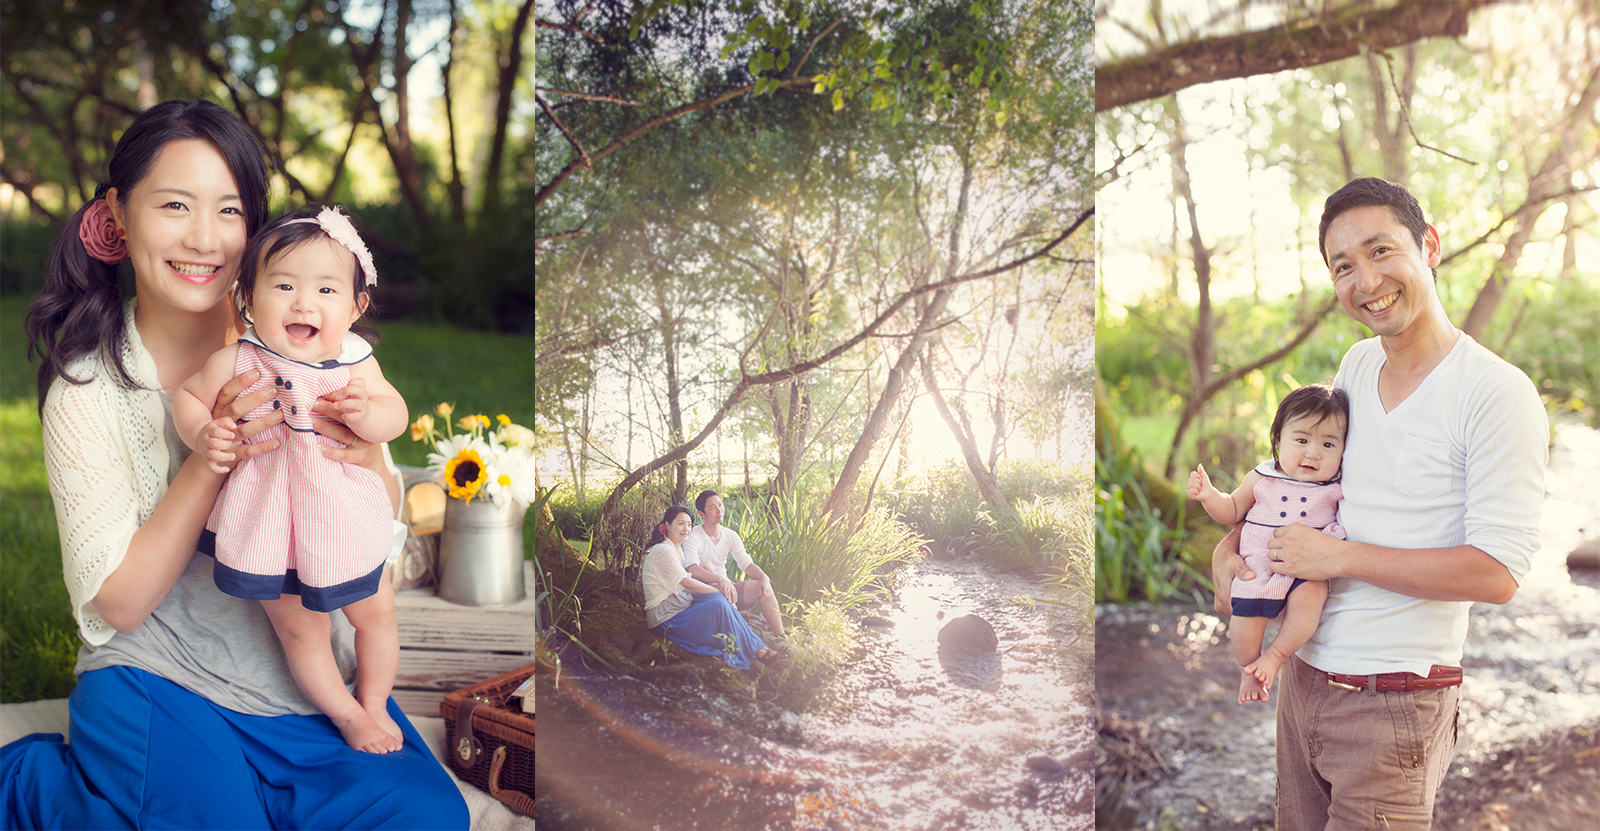 Kimi-Photography-Family-picture-Portland-Oregon